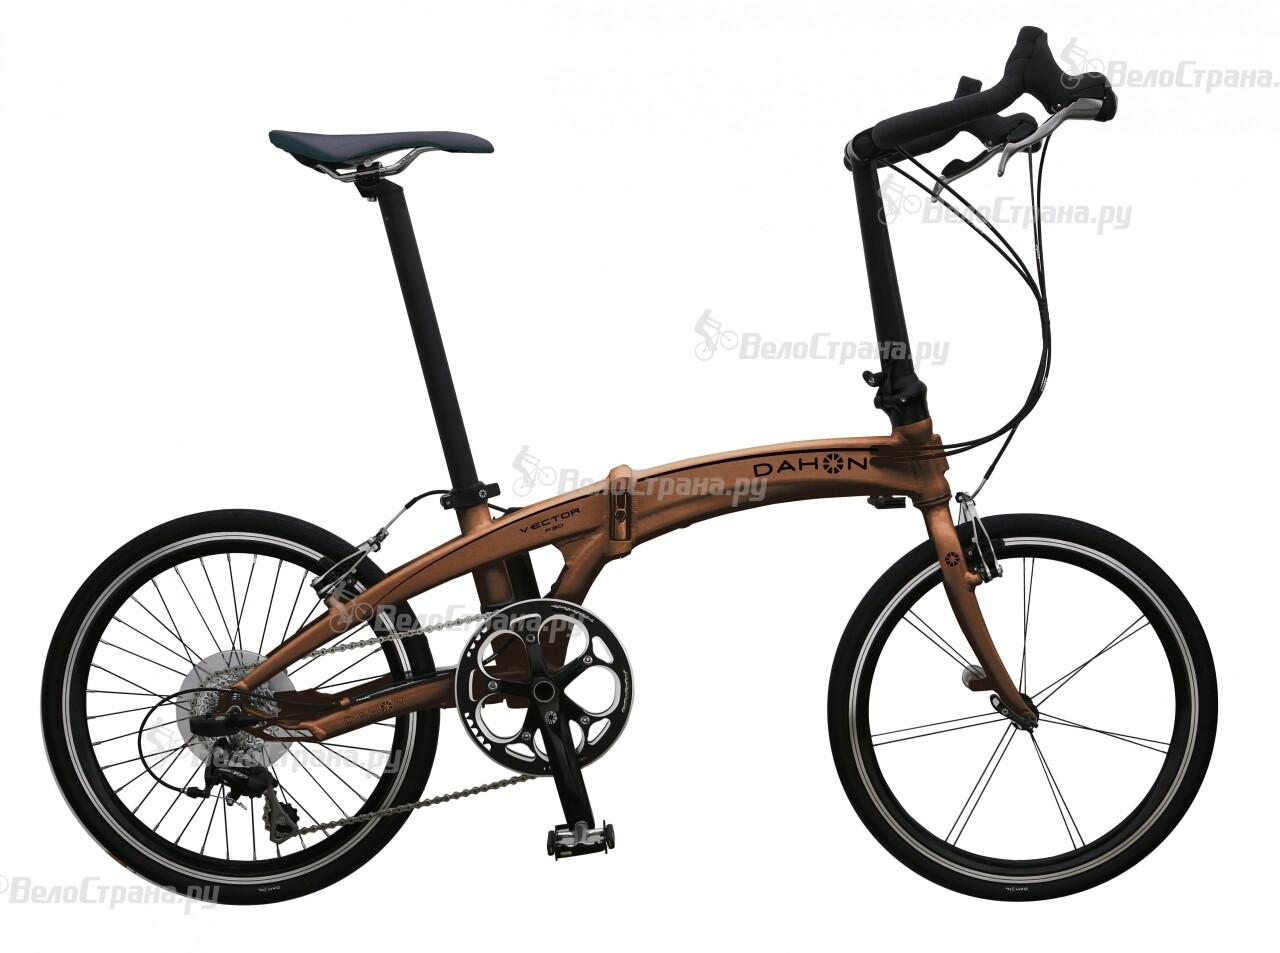 Велосипед Dahon Vector DD30 (2016) велосипед dahon speed d7 2015